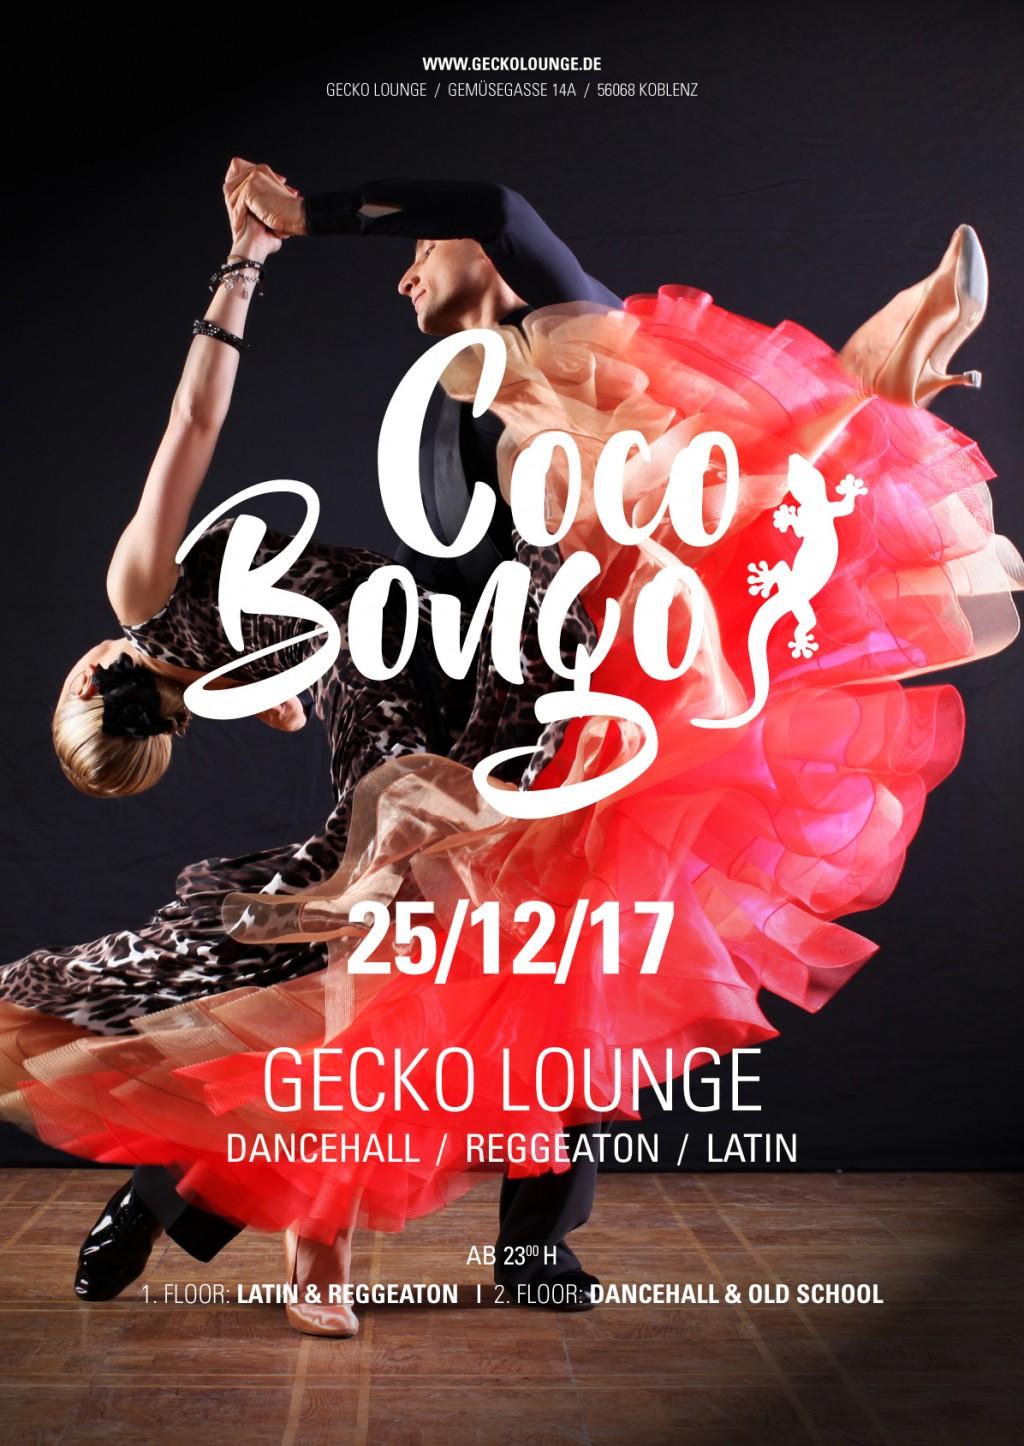 soheyl nassary GECKO LOUNGE / COCO BONGO